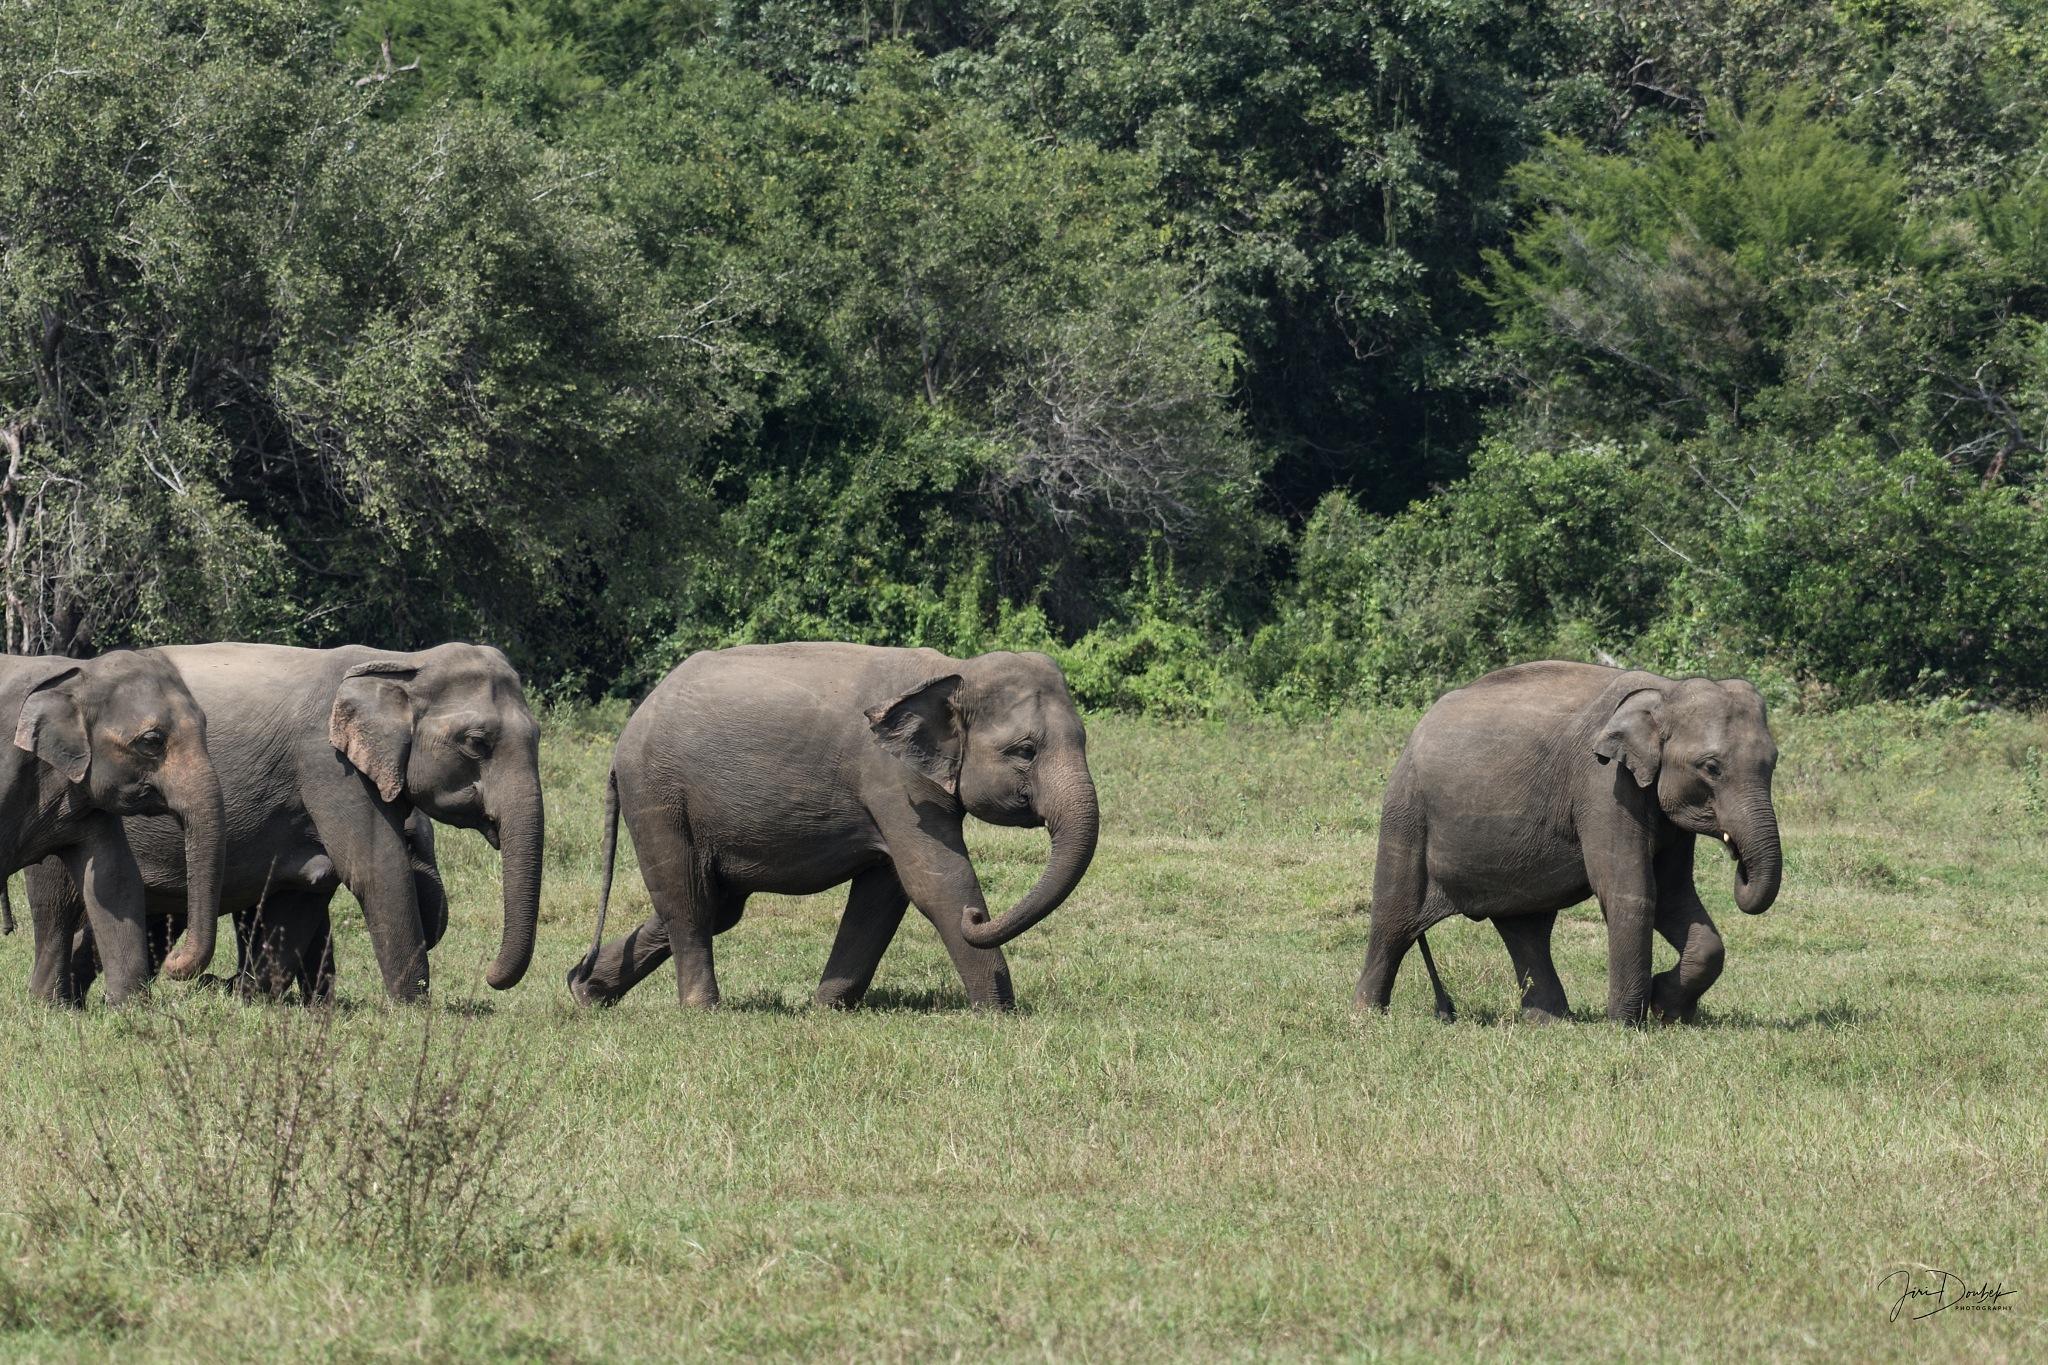 Elephants by Jiri Doubek